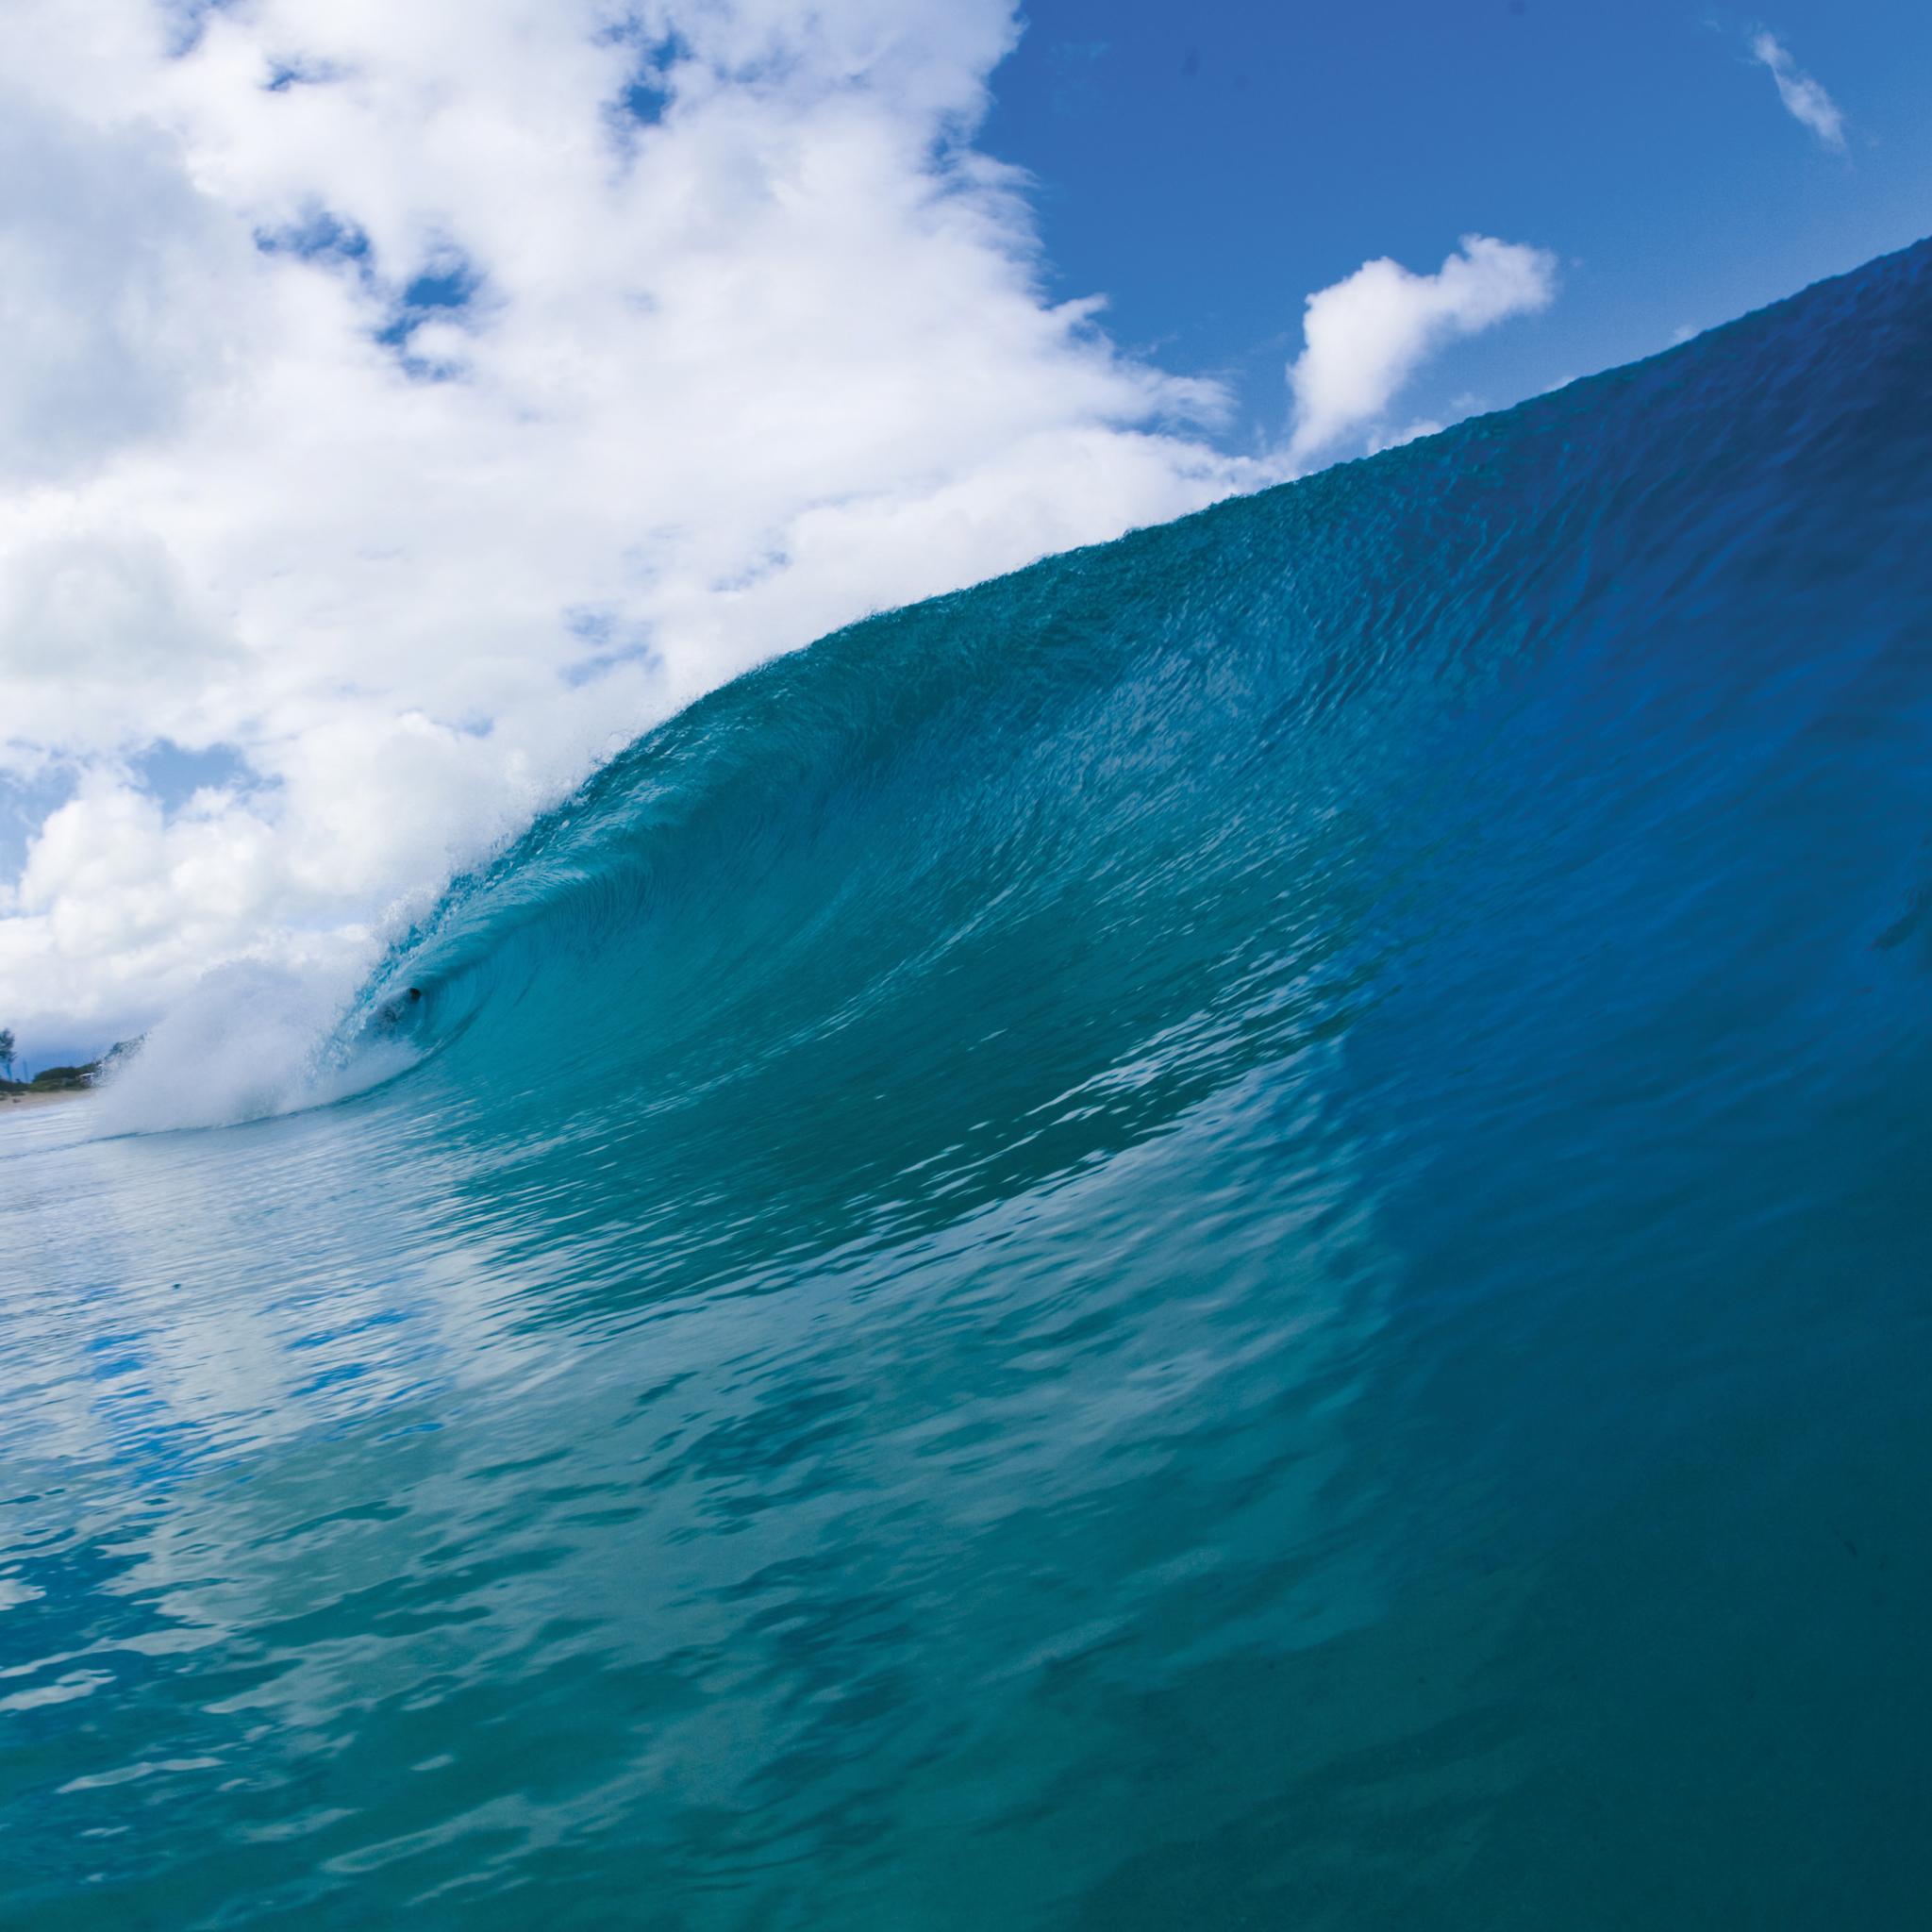 Surfer in Wave 3Wallpapers iPad Retina Surfer in Wave   iPad Retina